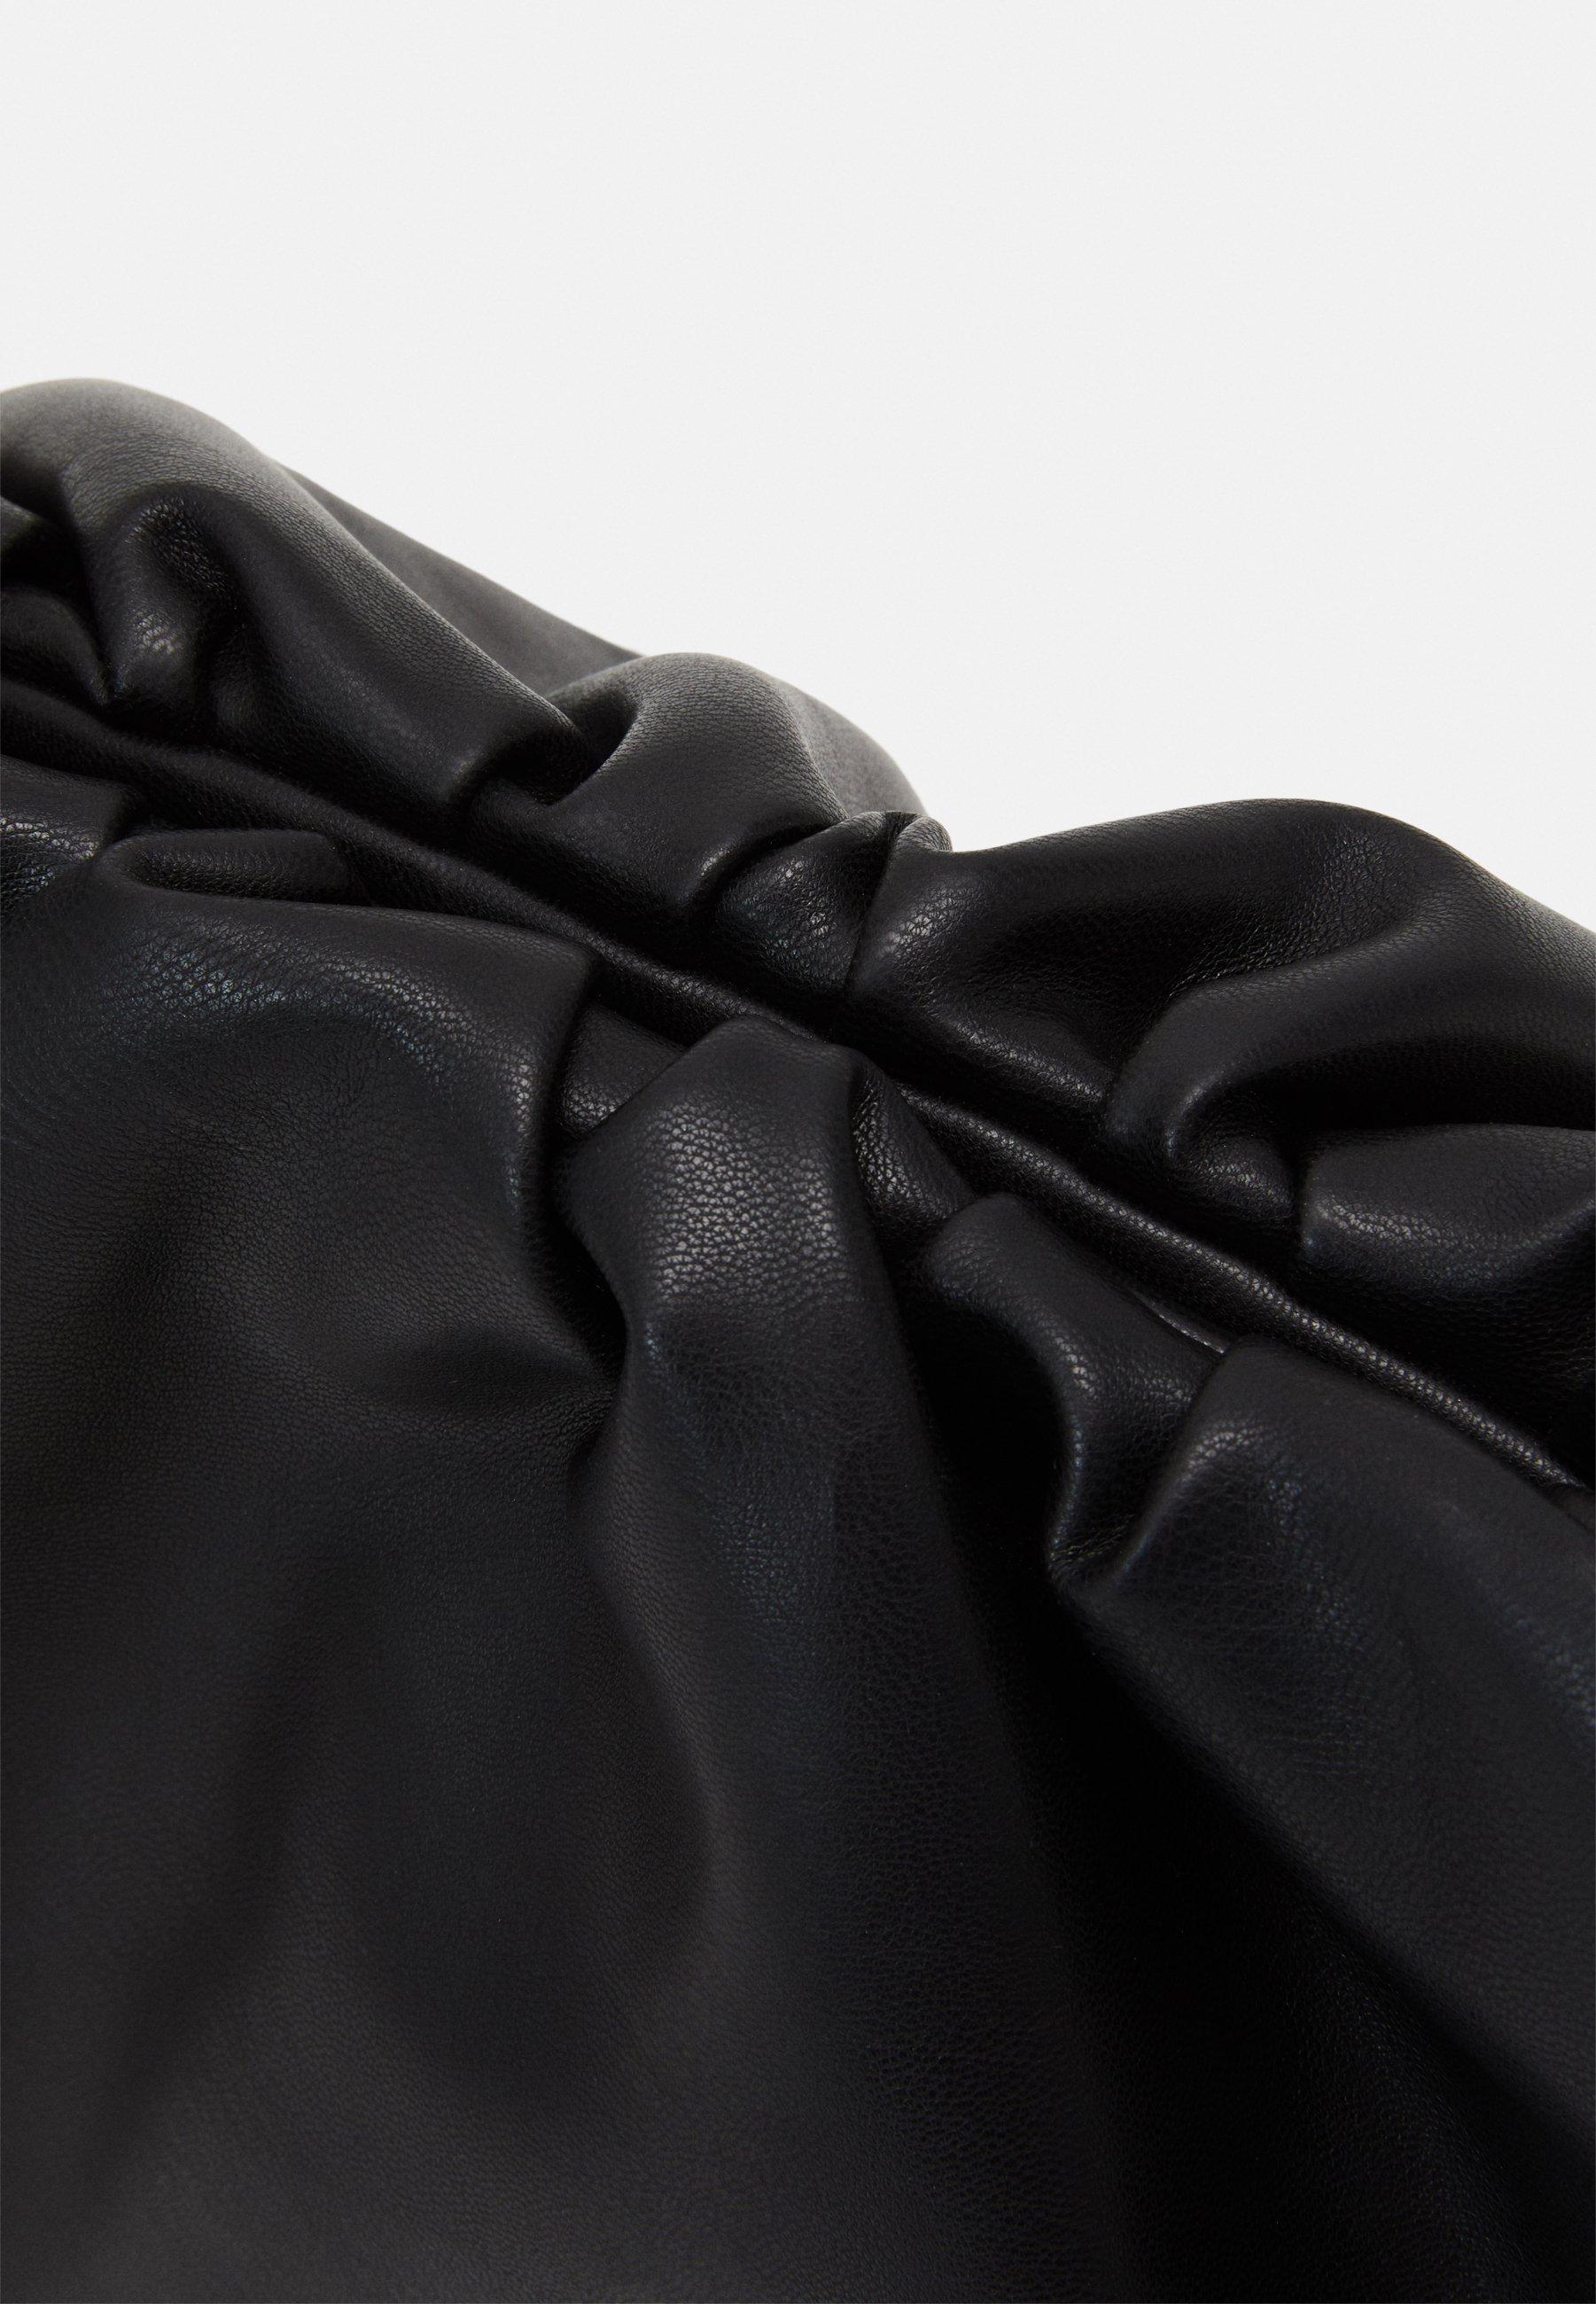 Steve Madden JESSICA POUCH - Clutch - black/svart Bex05Ror2gKno8K